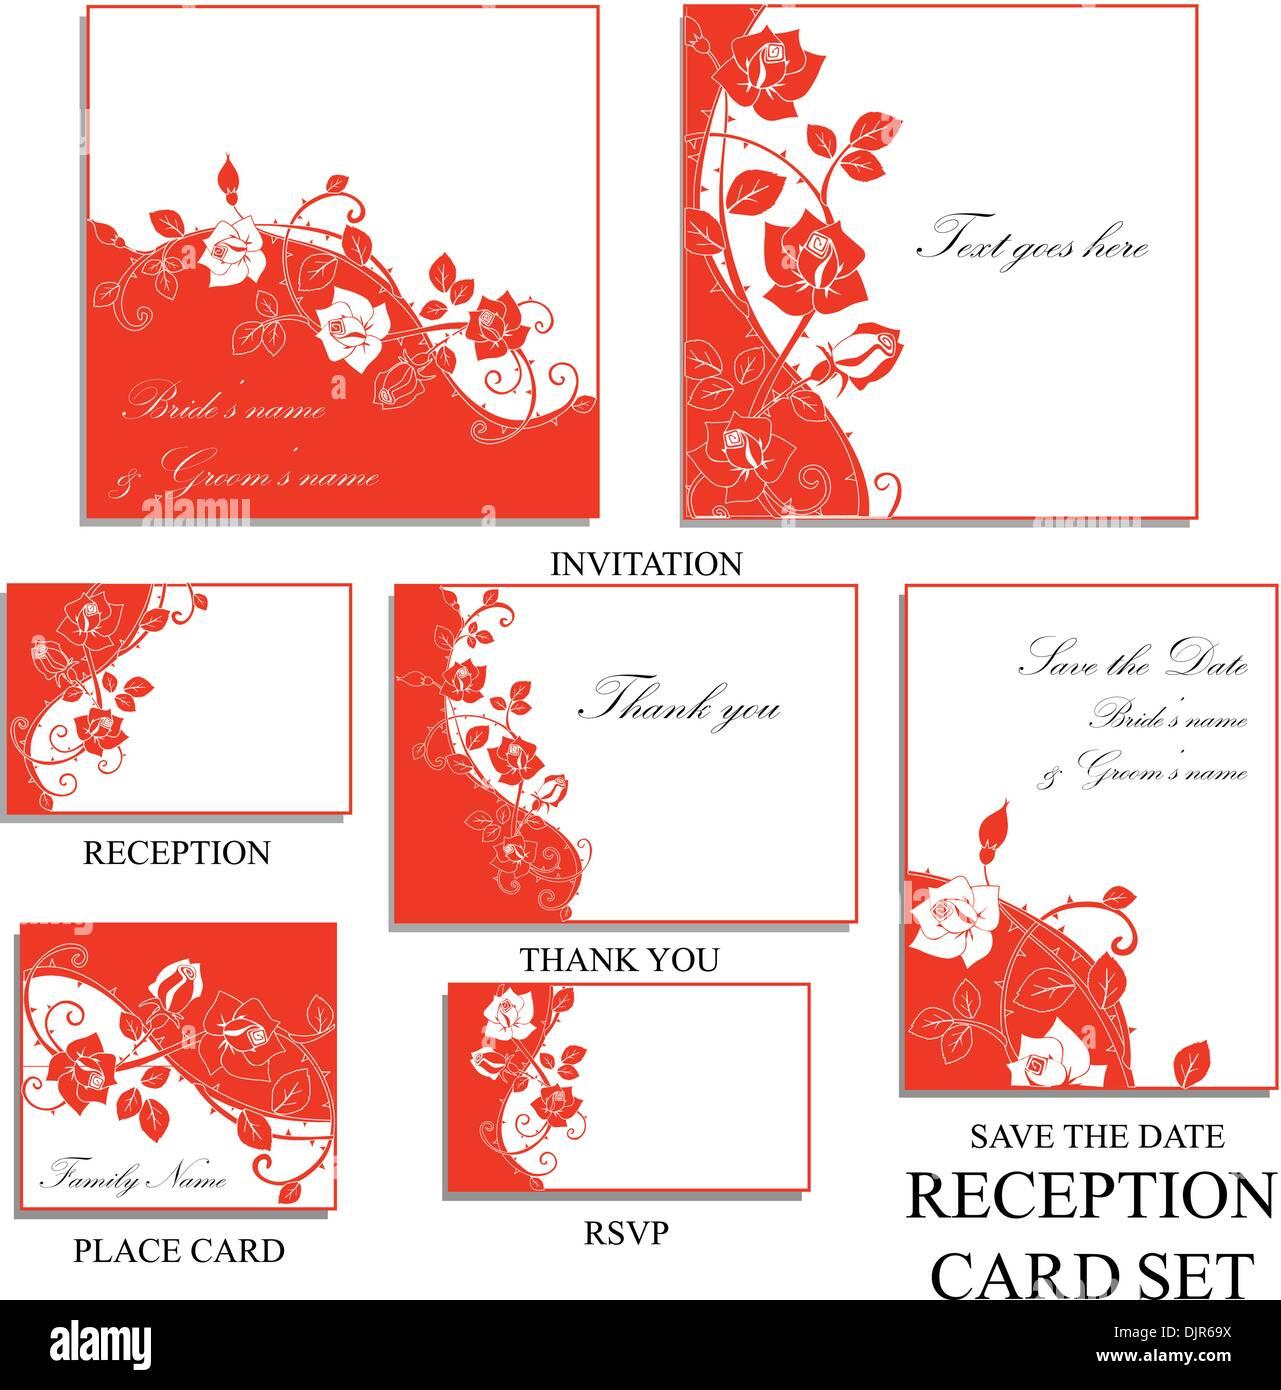 Wedding Invitation Rsvp Thank Card Stock Photos & Wedding Invitation ...